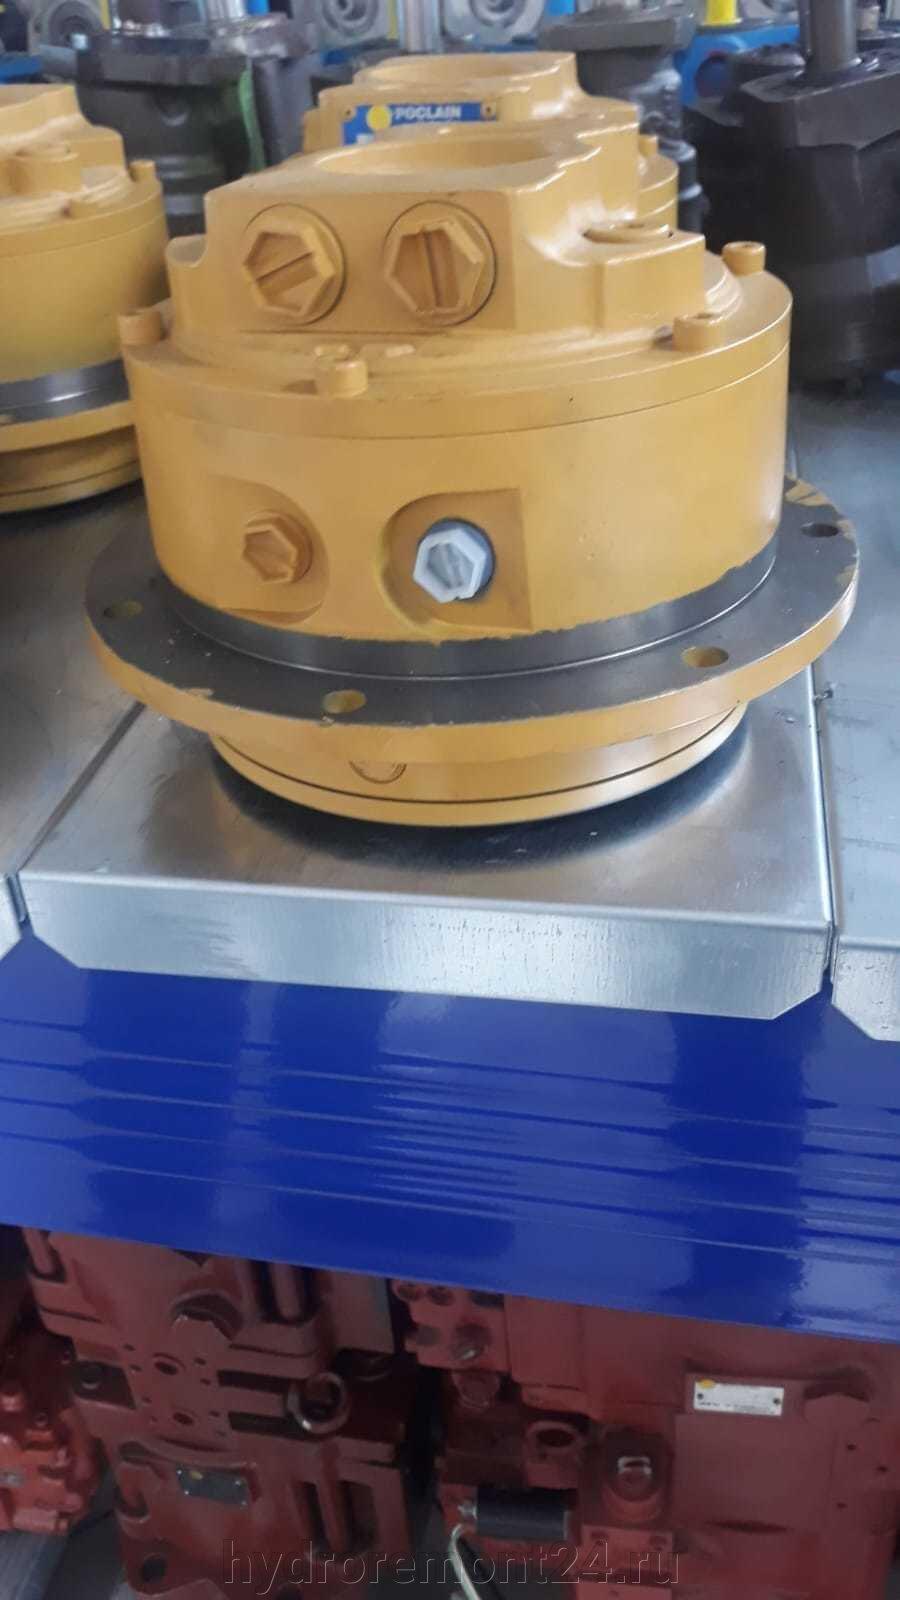 Восстановленные гидромоторы Poclain - фото pic_82fb0e8702fad3b97cb5632efc0cf755_1920x9000_1.jpg